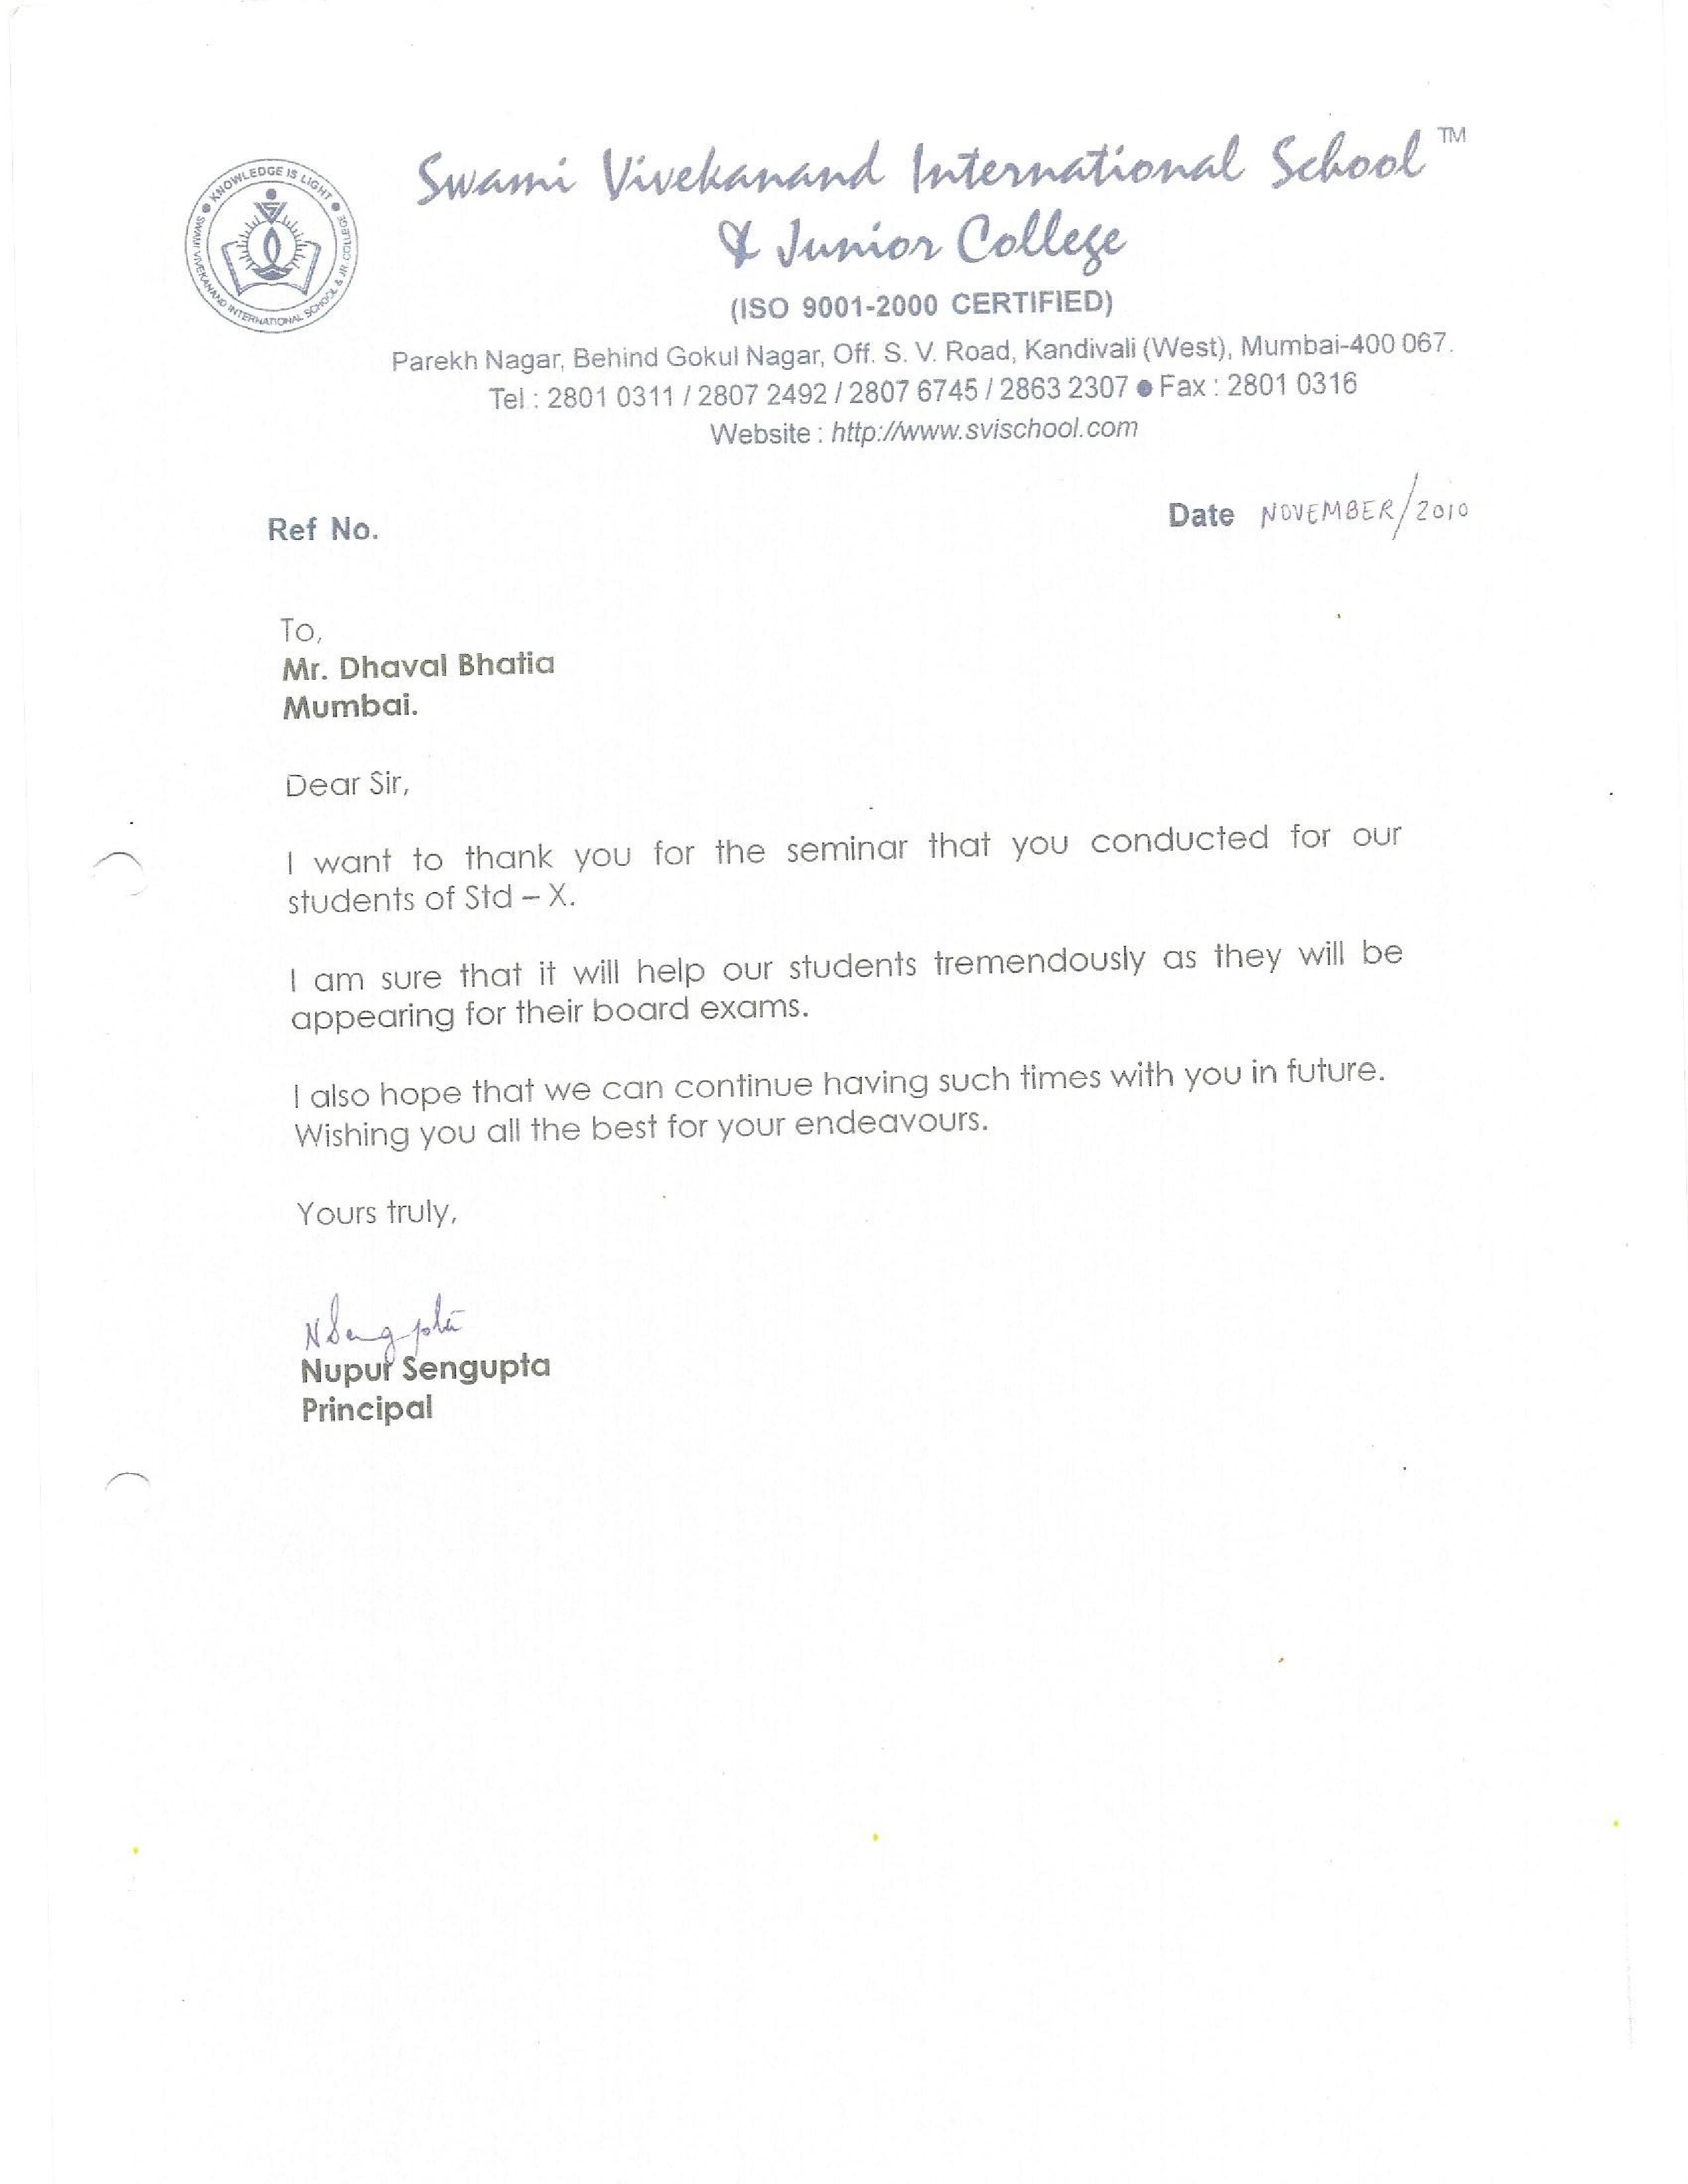 Swami Vivekanand School Mumbai